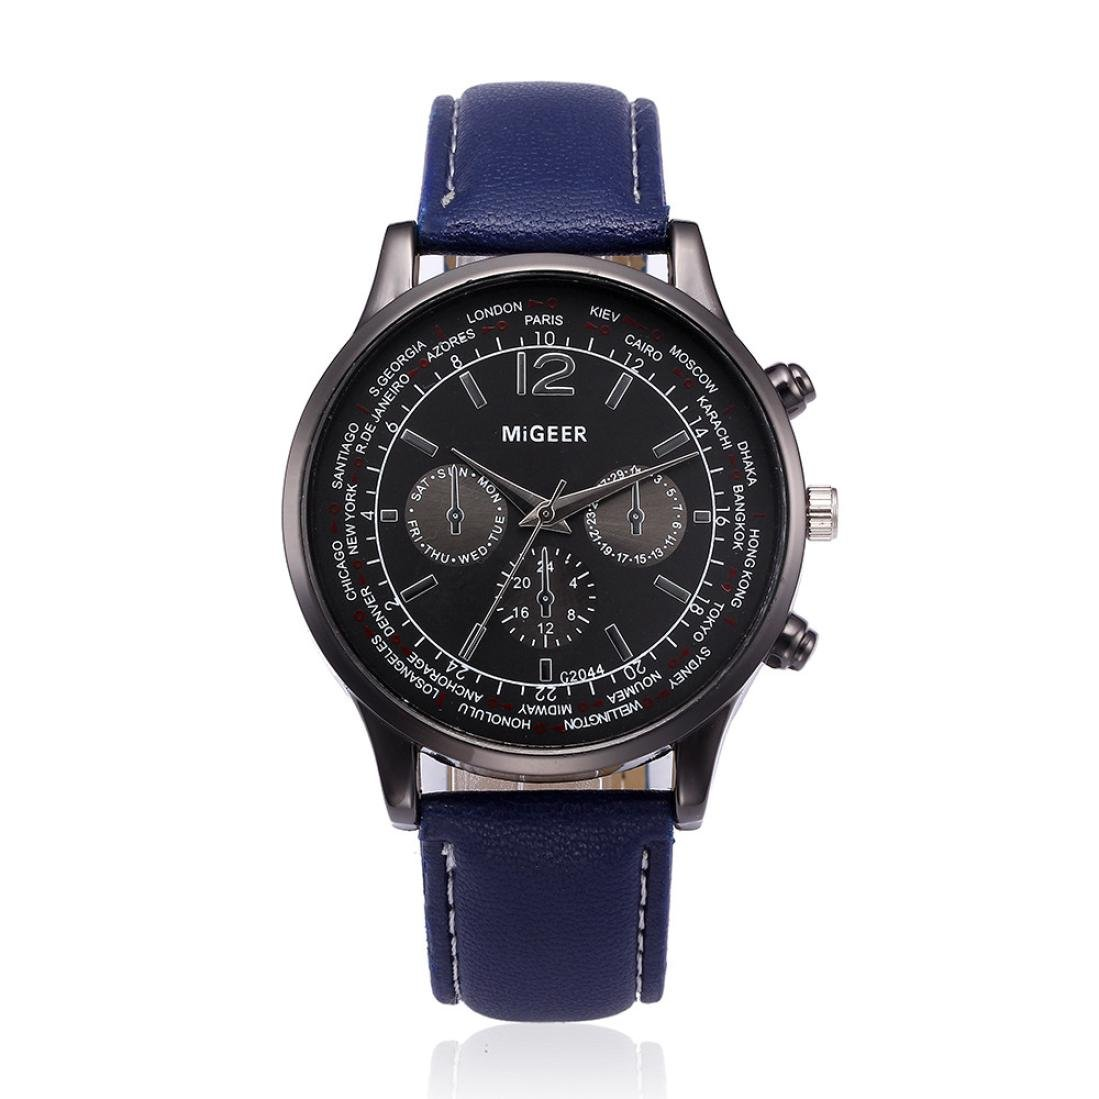 Nmch Big Promition,Mens Watch Classics Retro Wristwatch Leather Band Analog Alloy Quartz Watches (Blue)